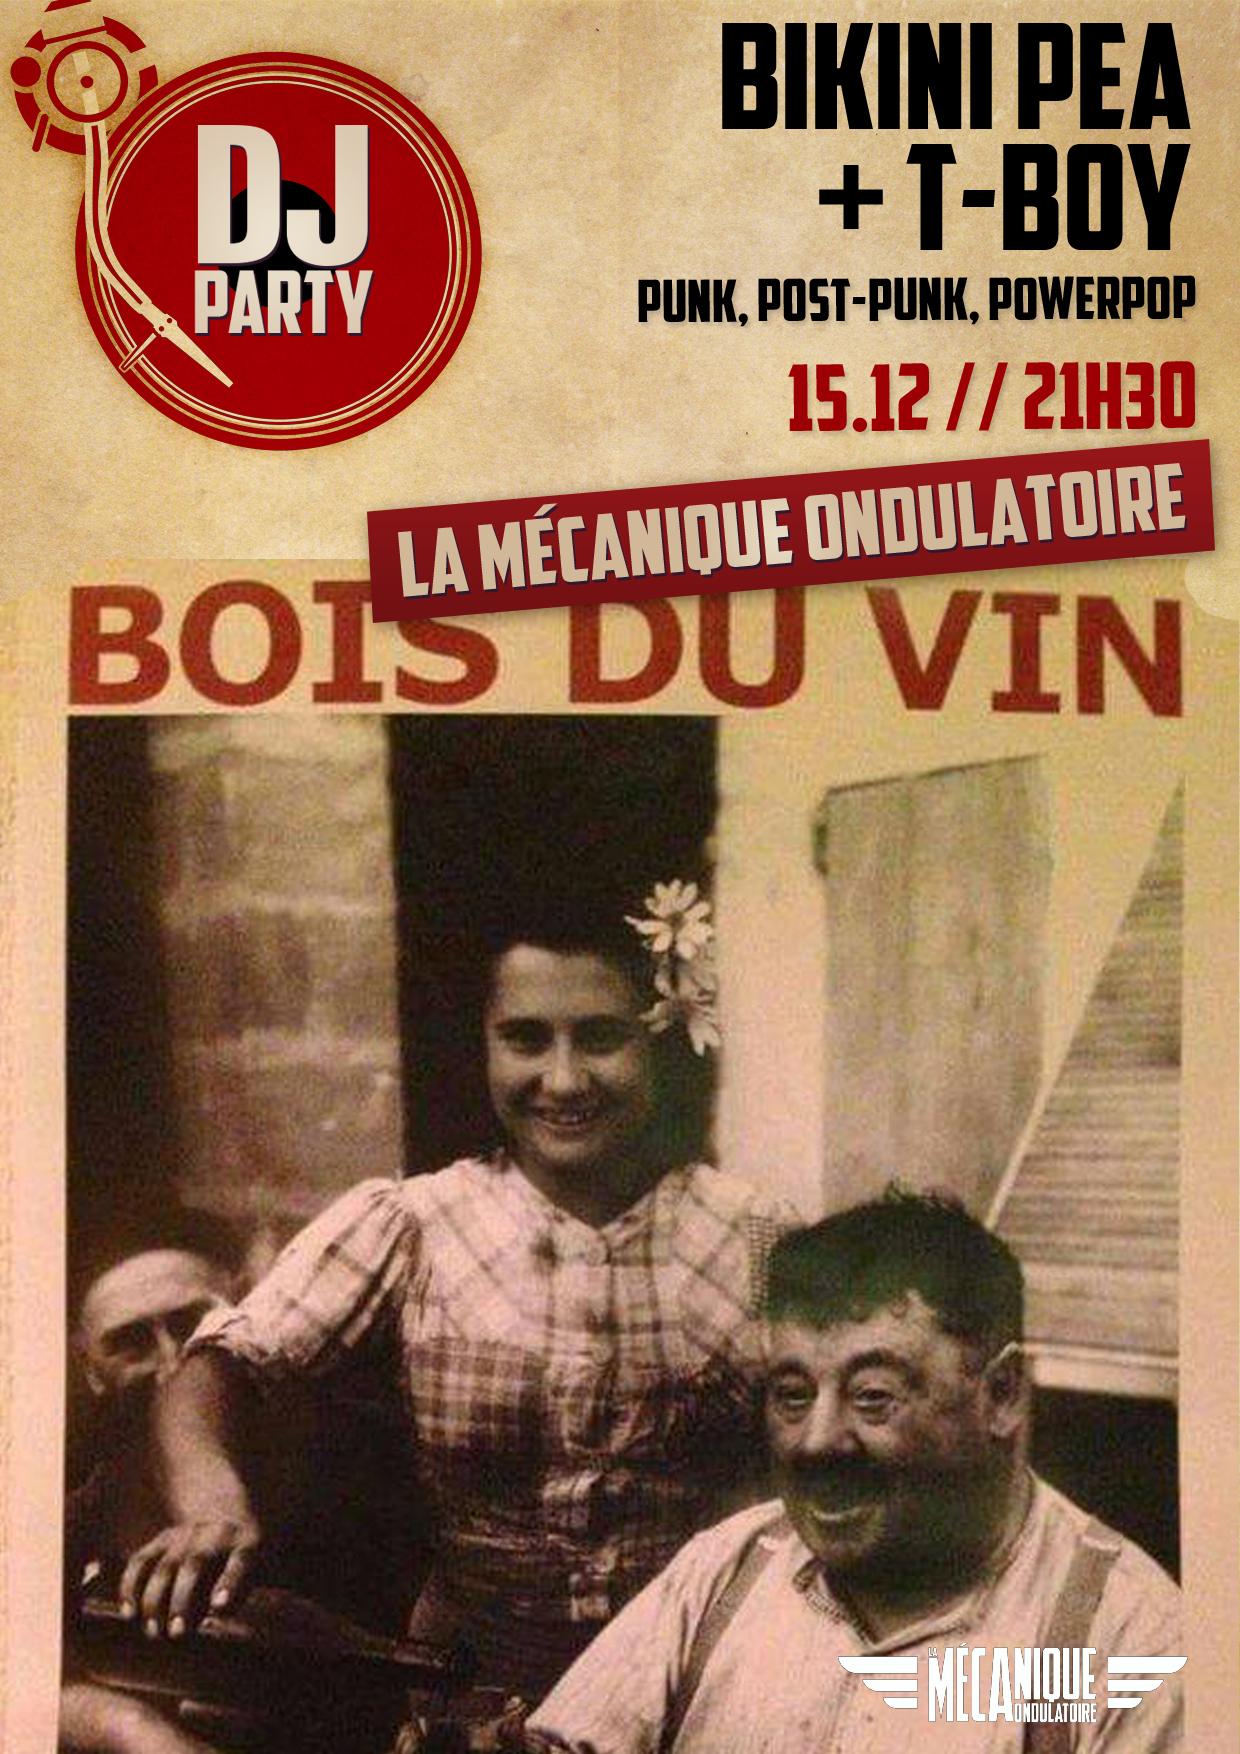 BIKINI PEA + T-BOY DJ SET // 15.12